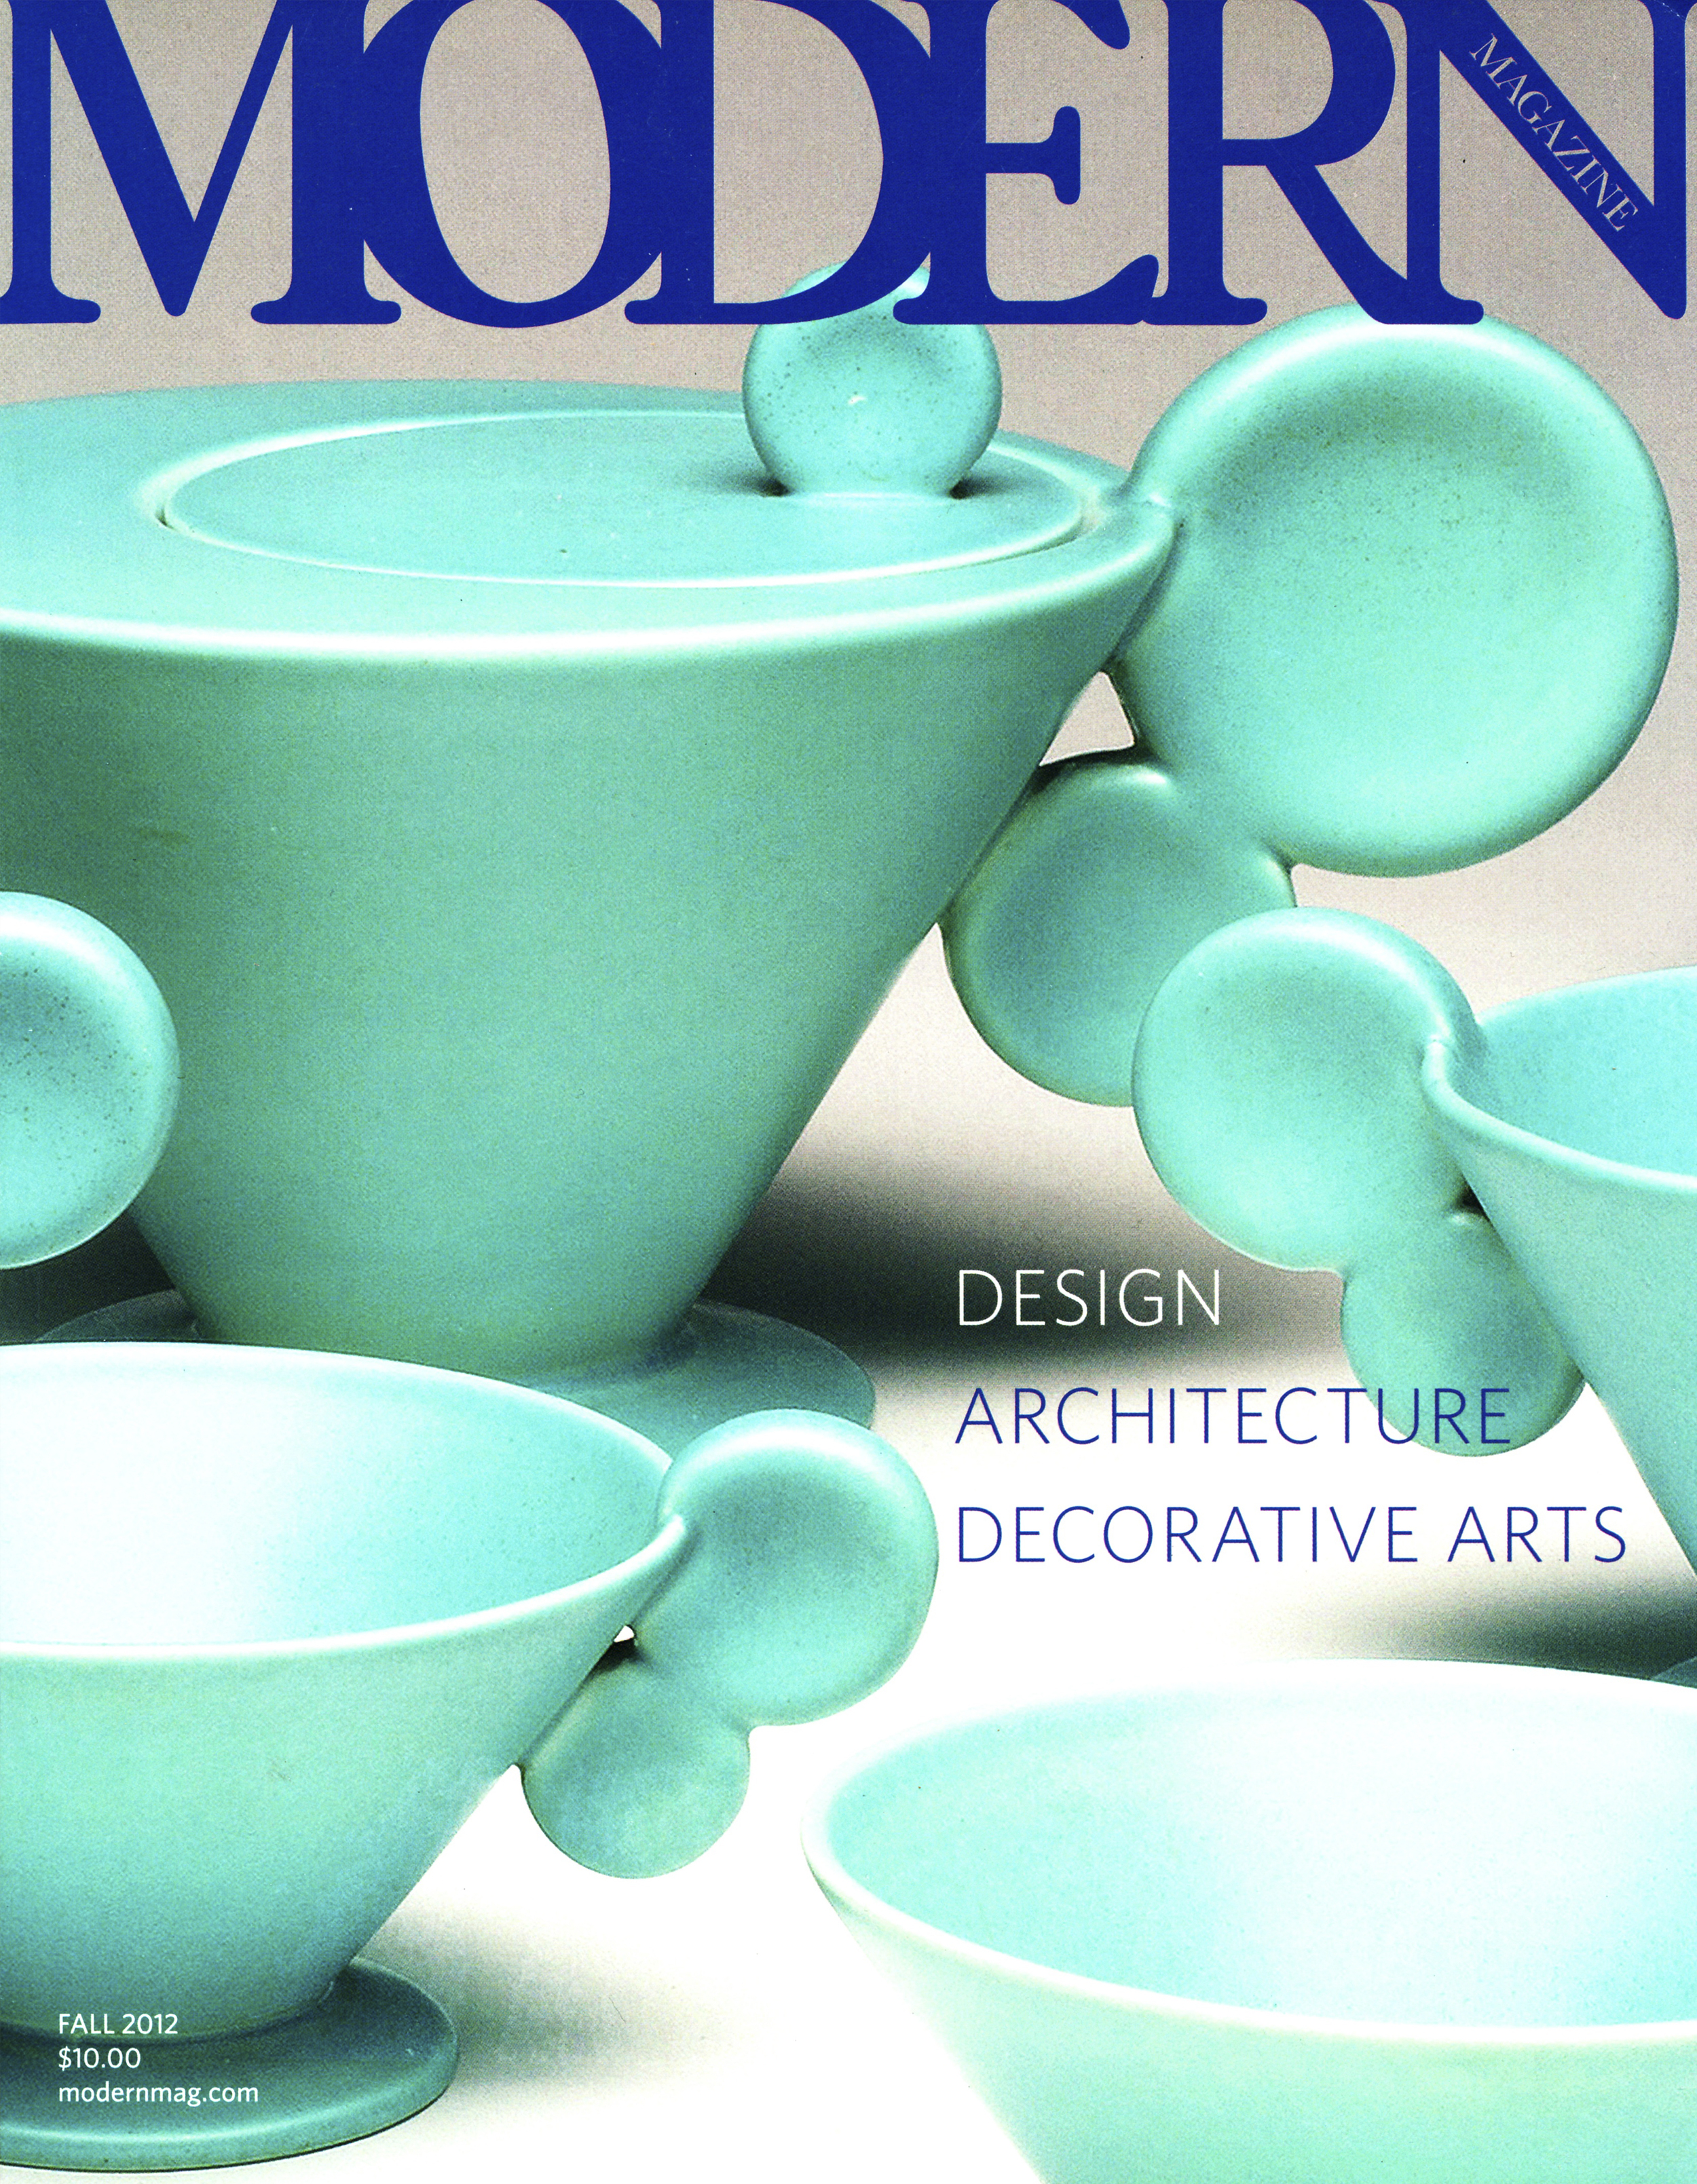 Woman's Work, Modern Magazine, 2012